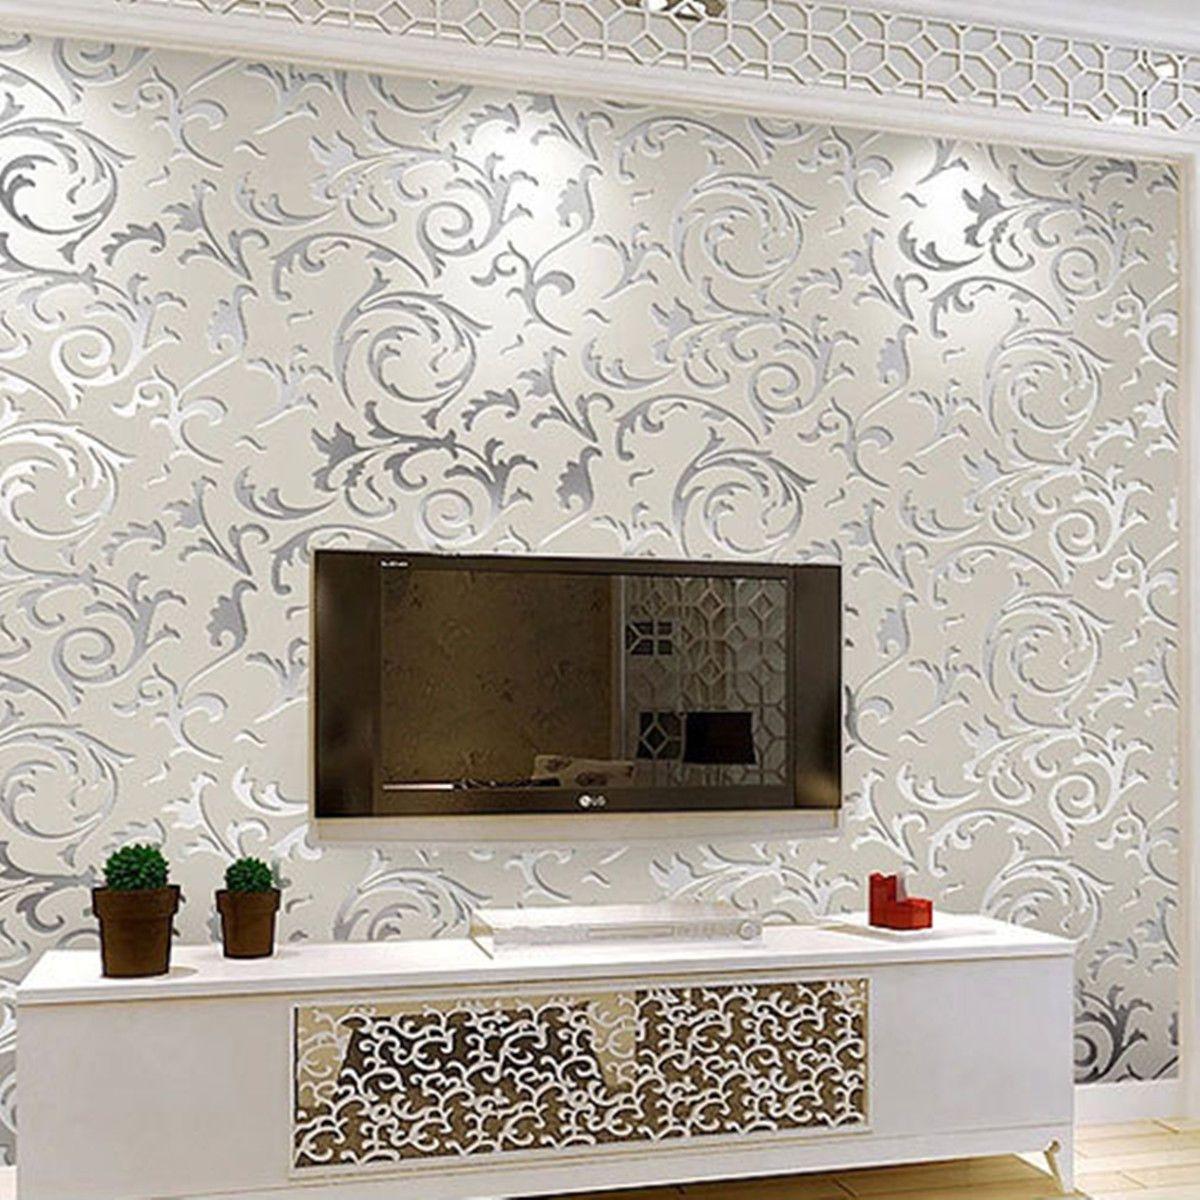 10m 3d Floral Textured Non Woven Wallpaper Rolls Hom